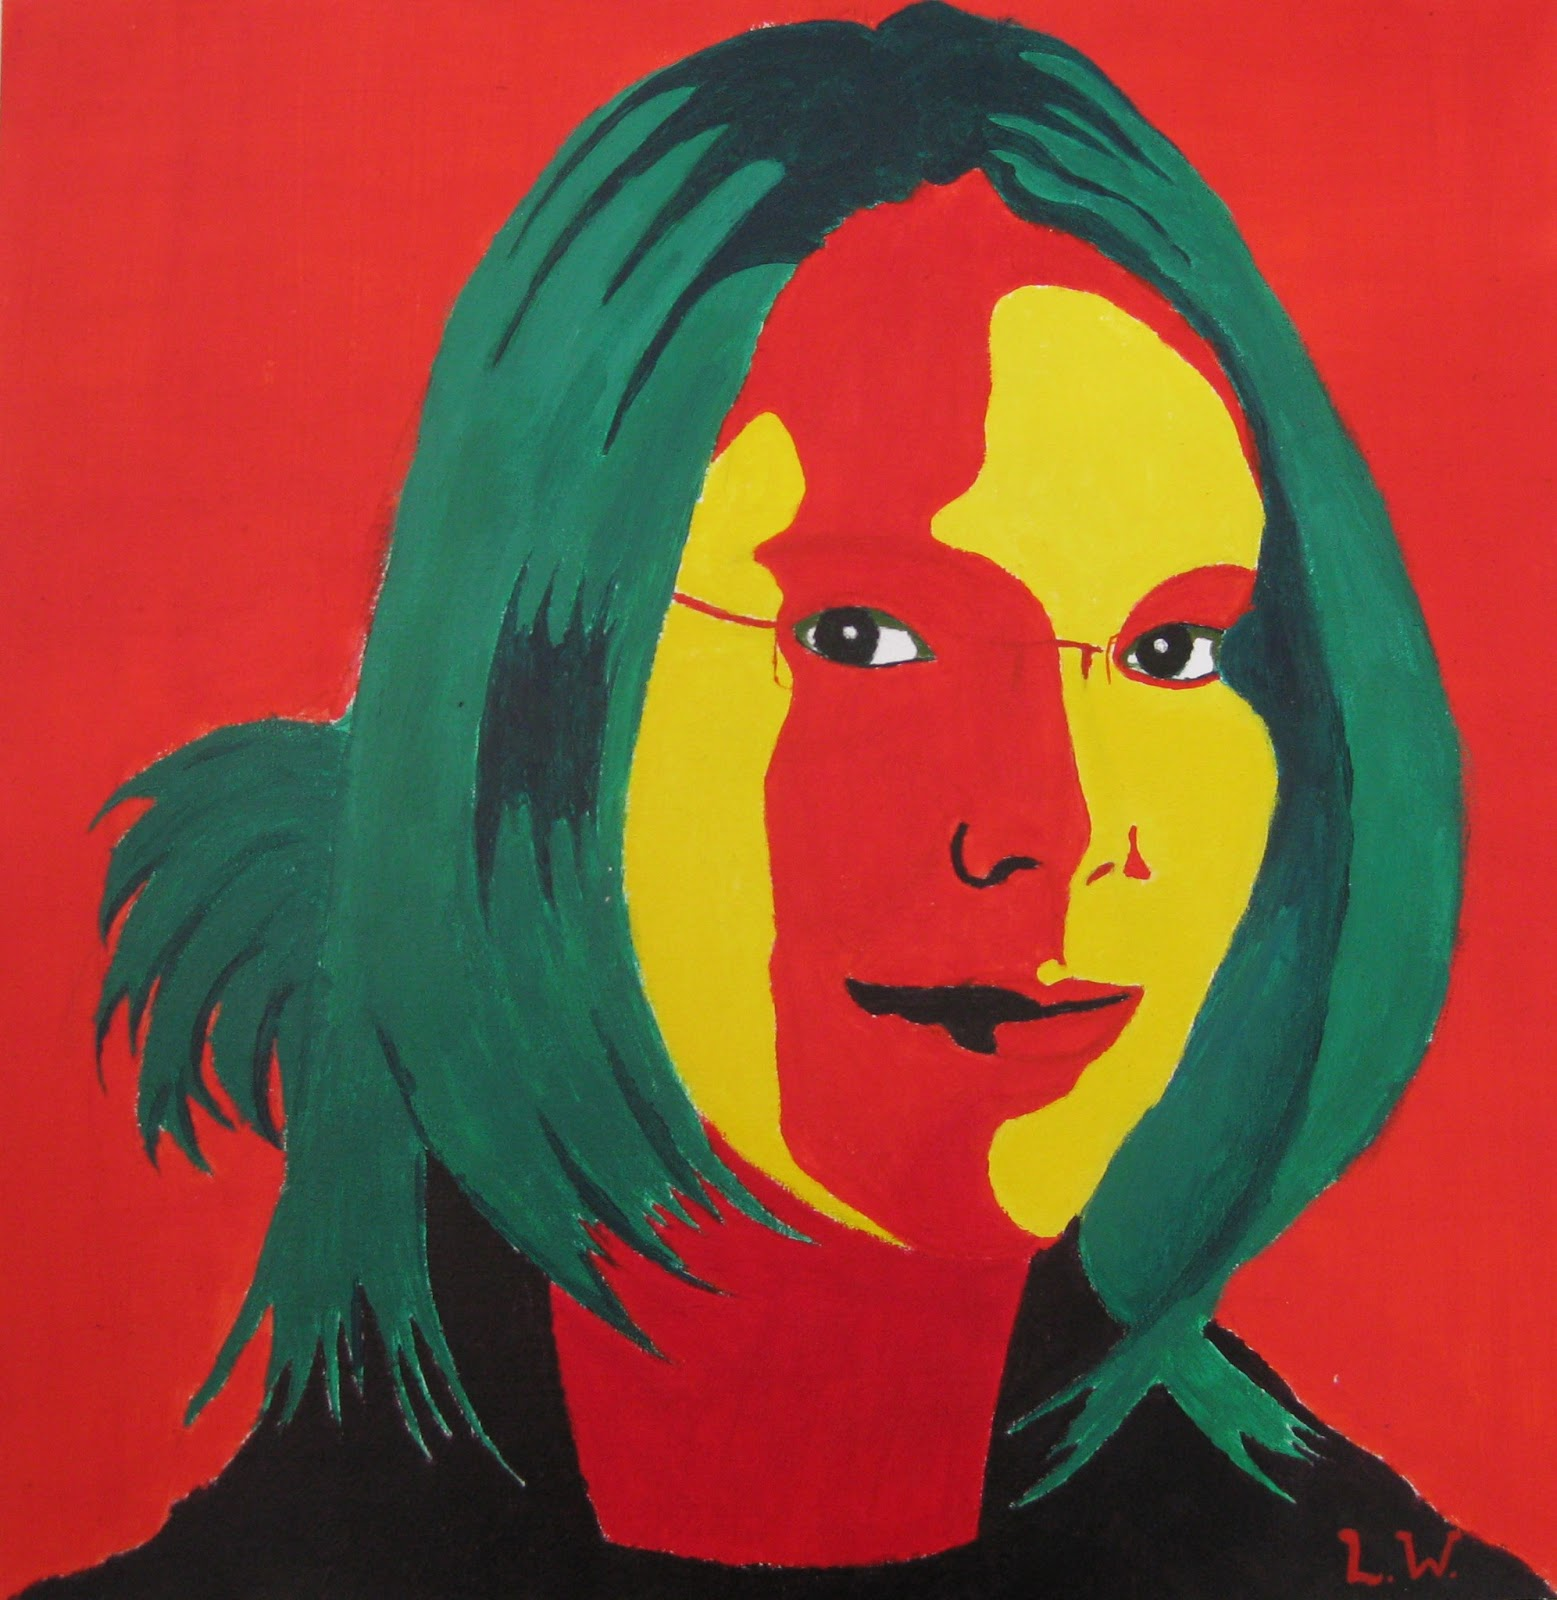 Animated Butterfly Wallpaper Andy Warhol Art Desktop Wallpapers